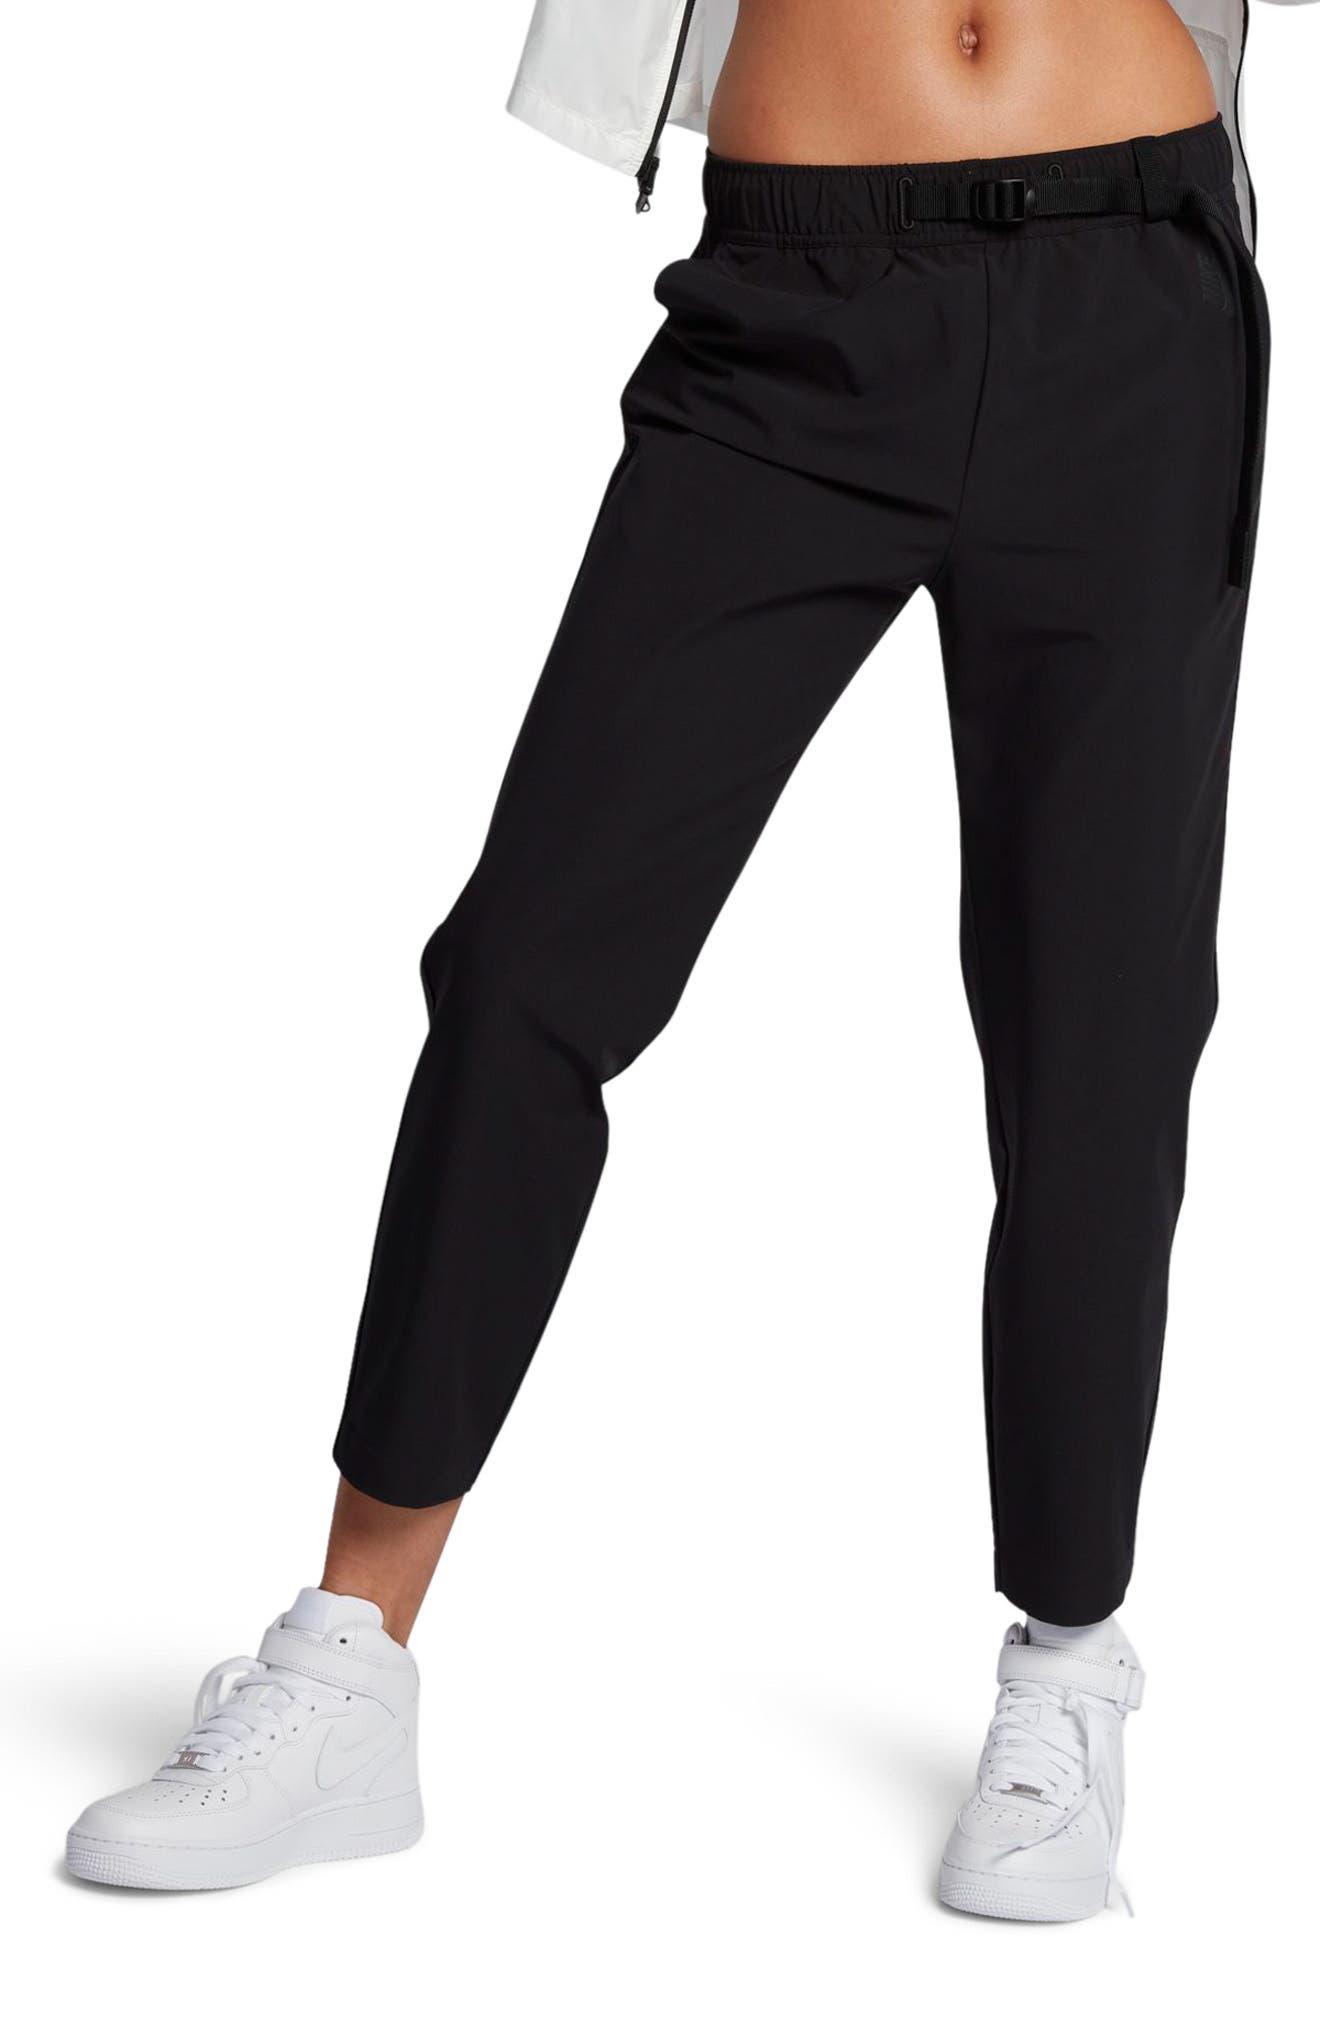 NikeLab Essentials Women's Stretch Woven Pants,                             Main thumbnail 1, color,                             Black/ Black